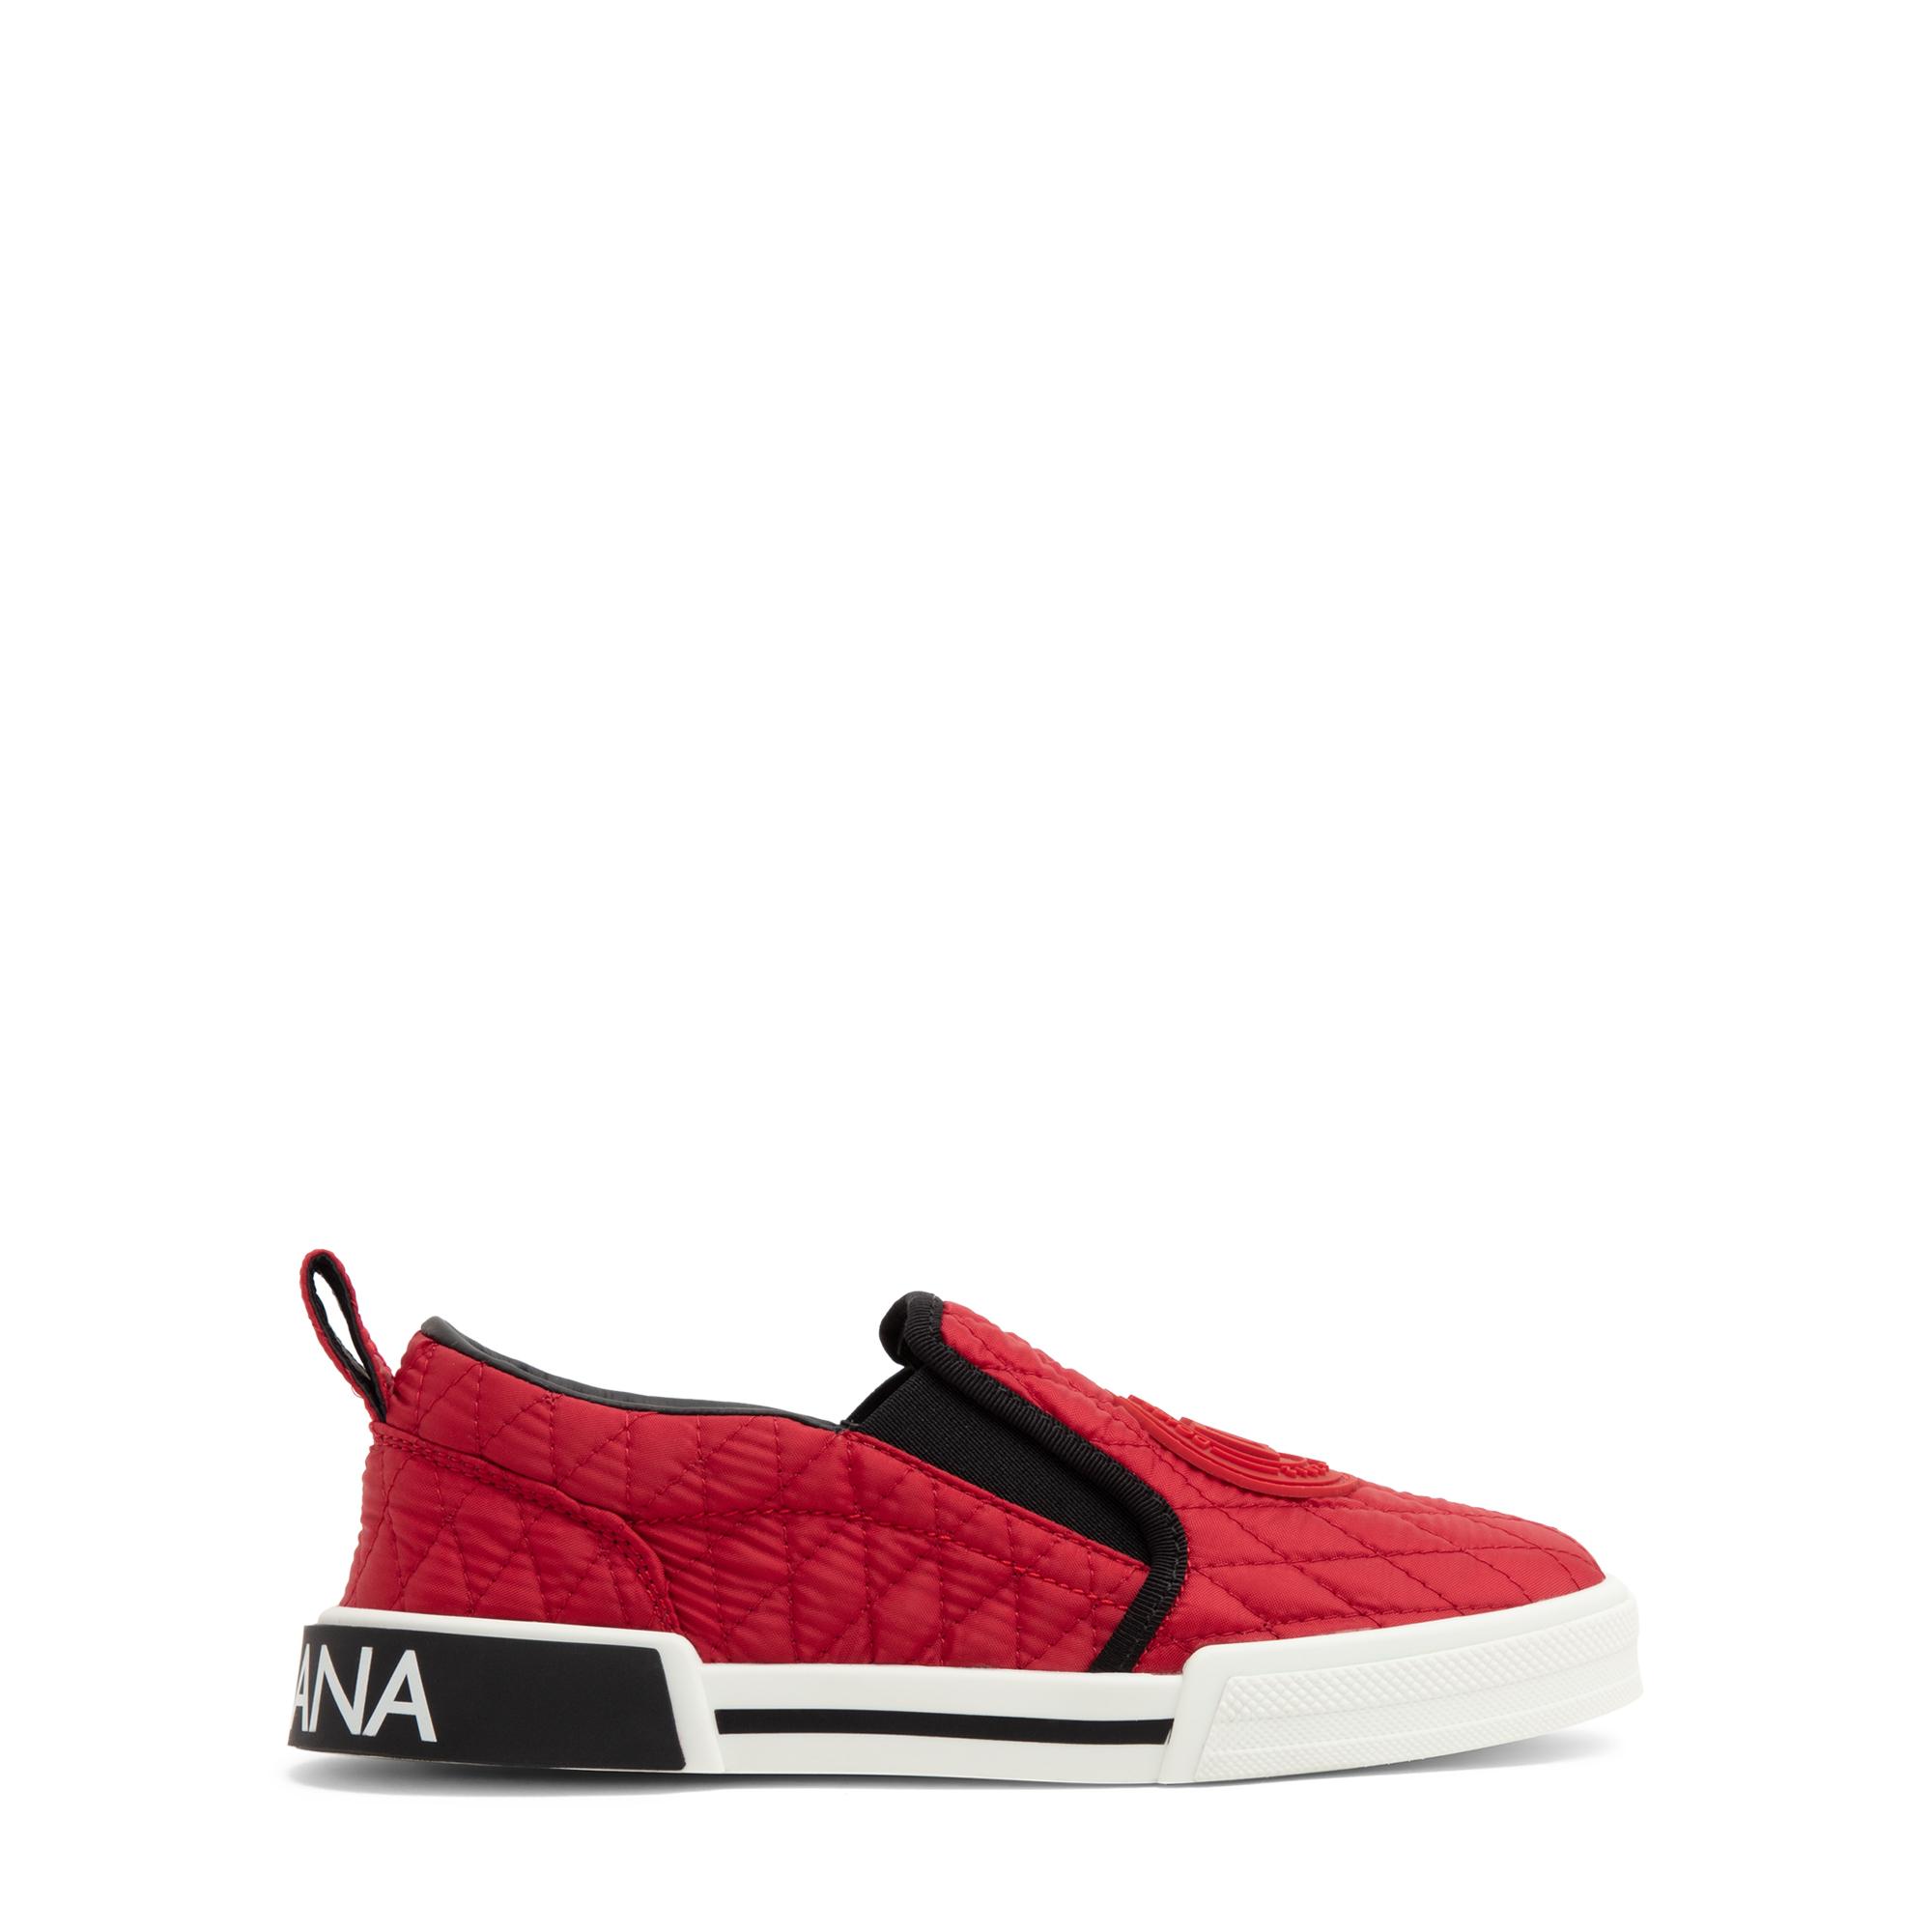 Nylon Portofino sneakers